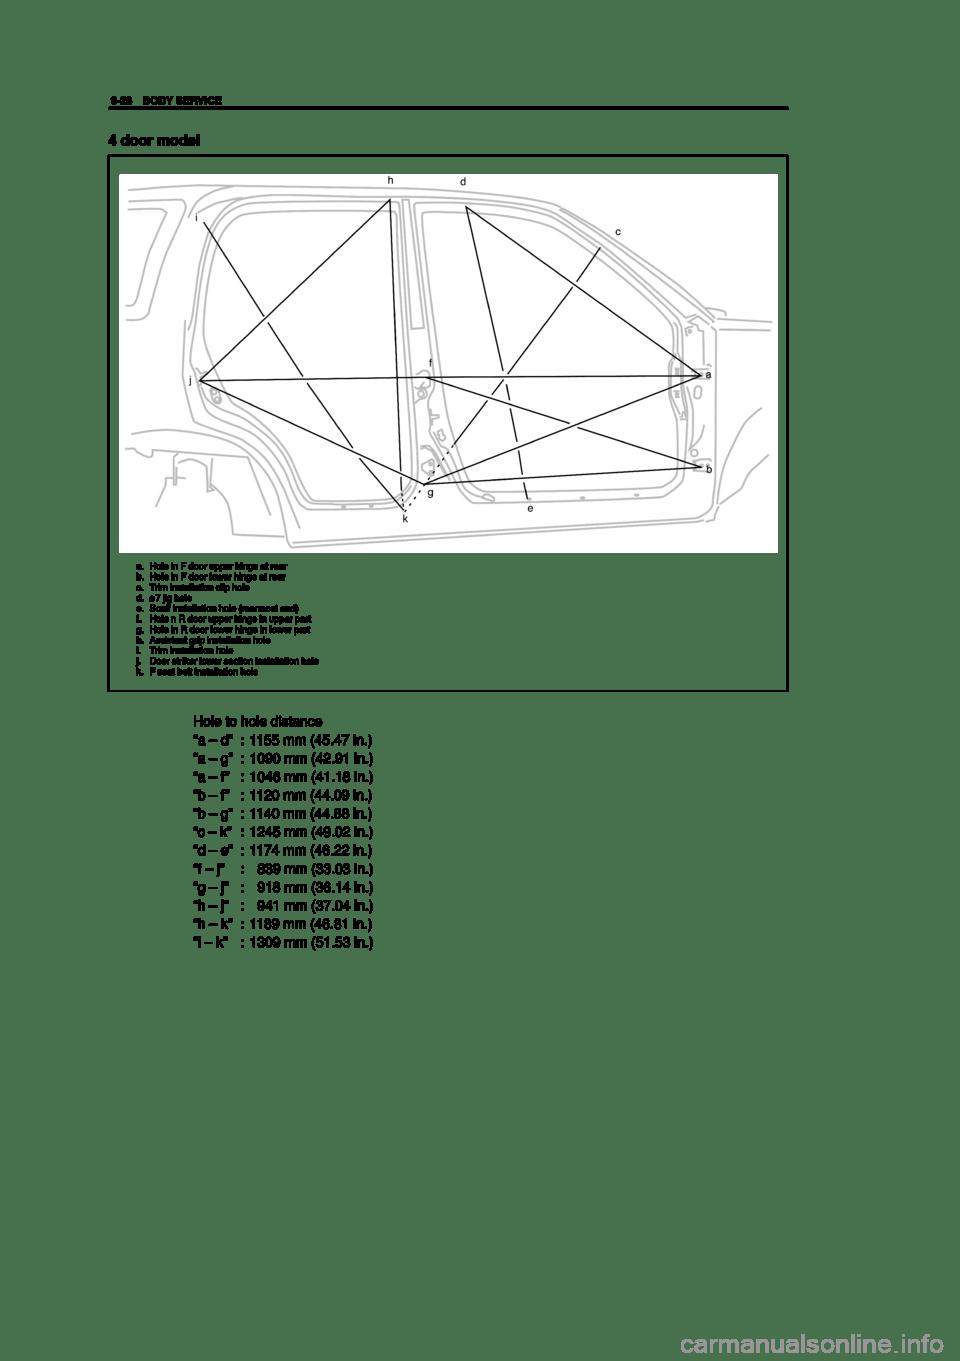 SUZUKI GRAND VITARA 2005 2.G Service Workshop Manual (801